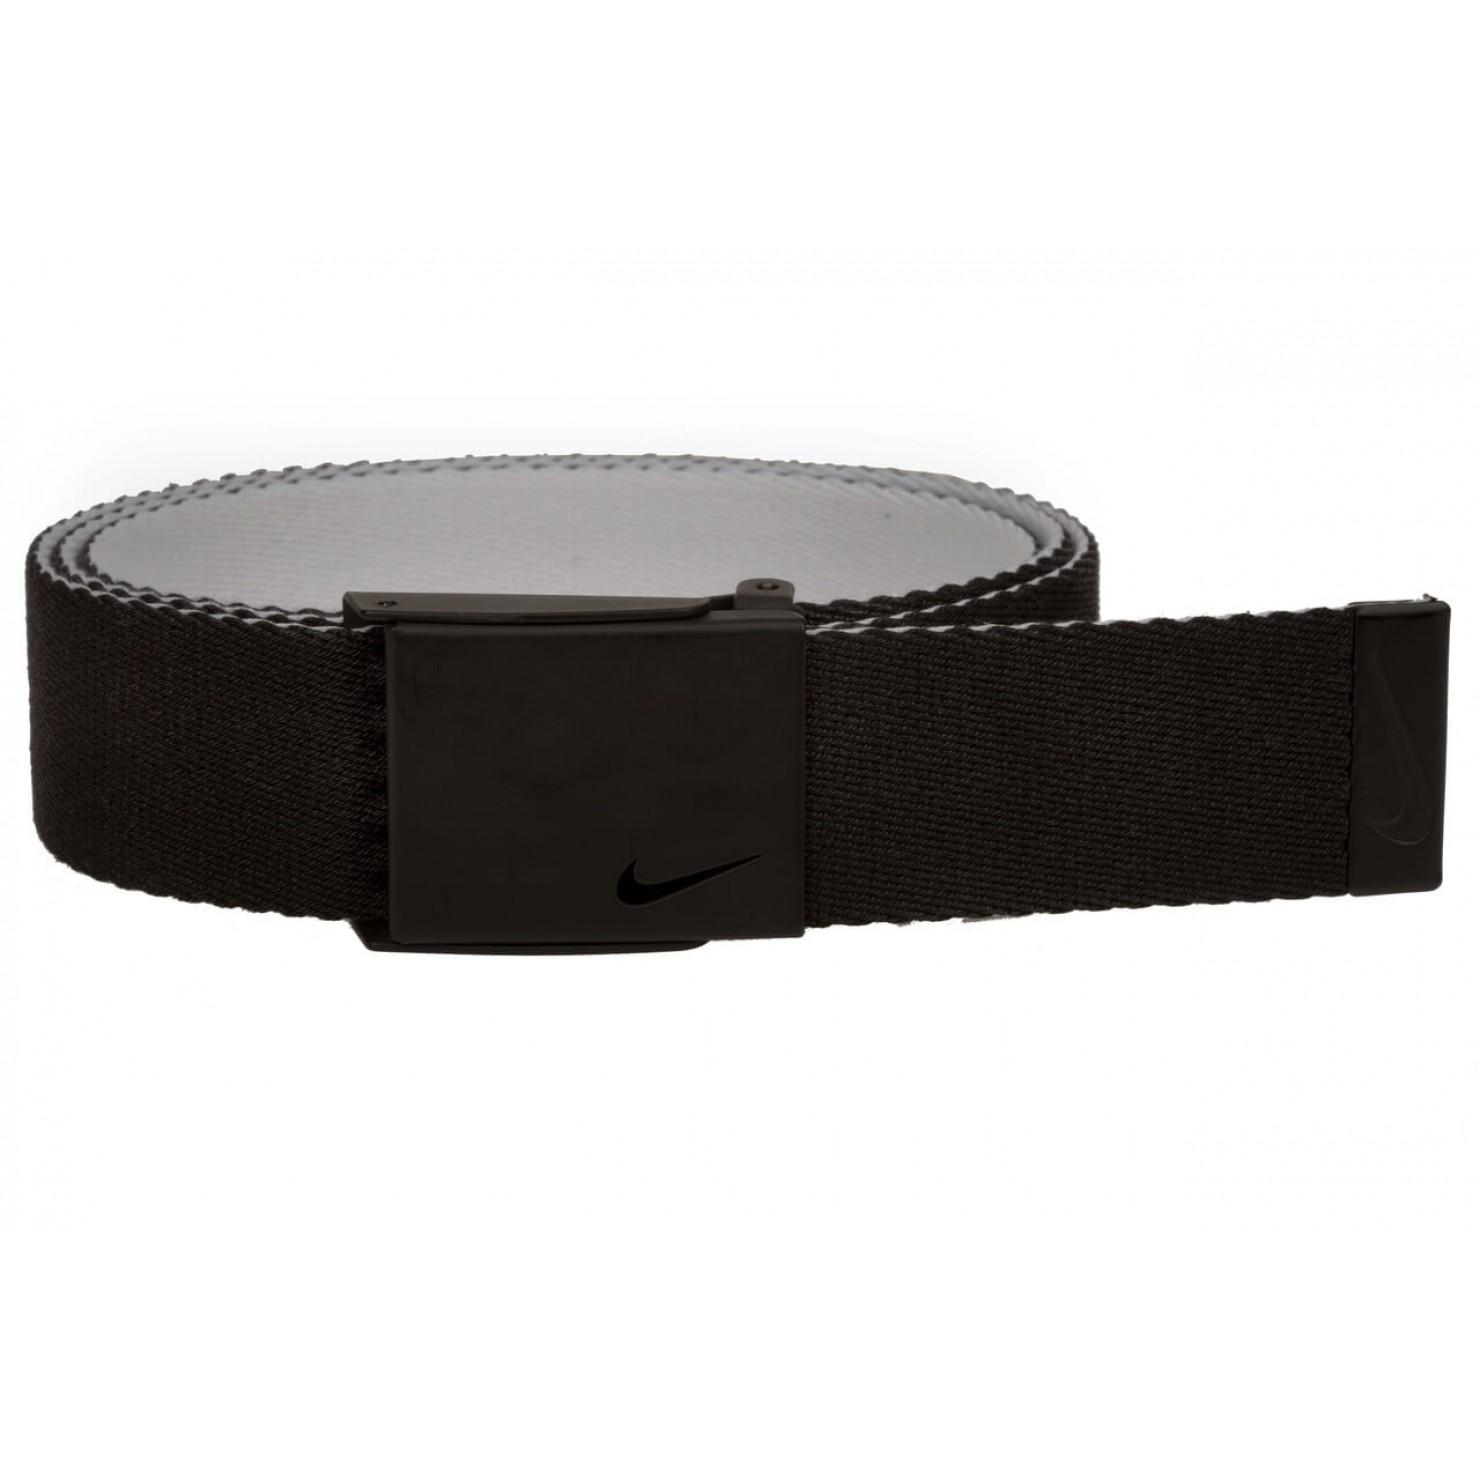 Nike Tech Essentials Reversible Web Belt